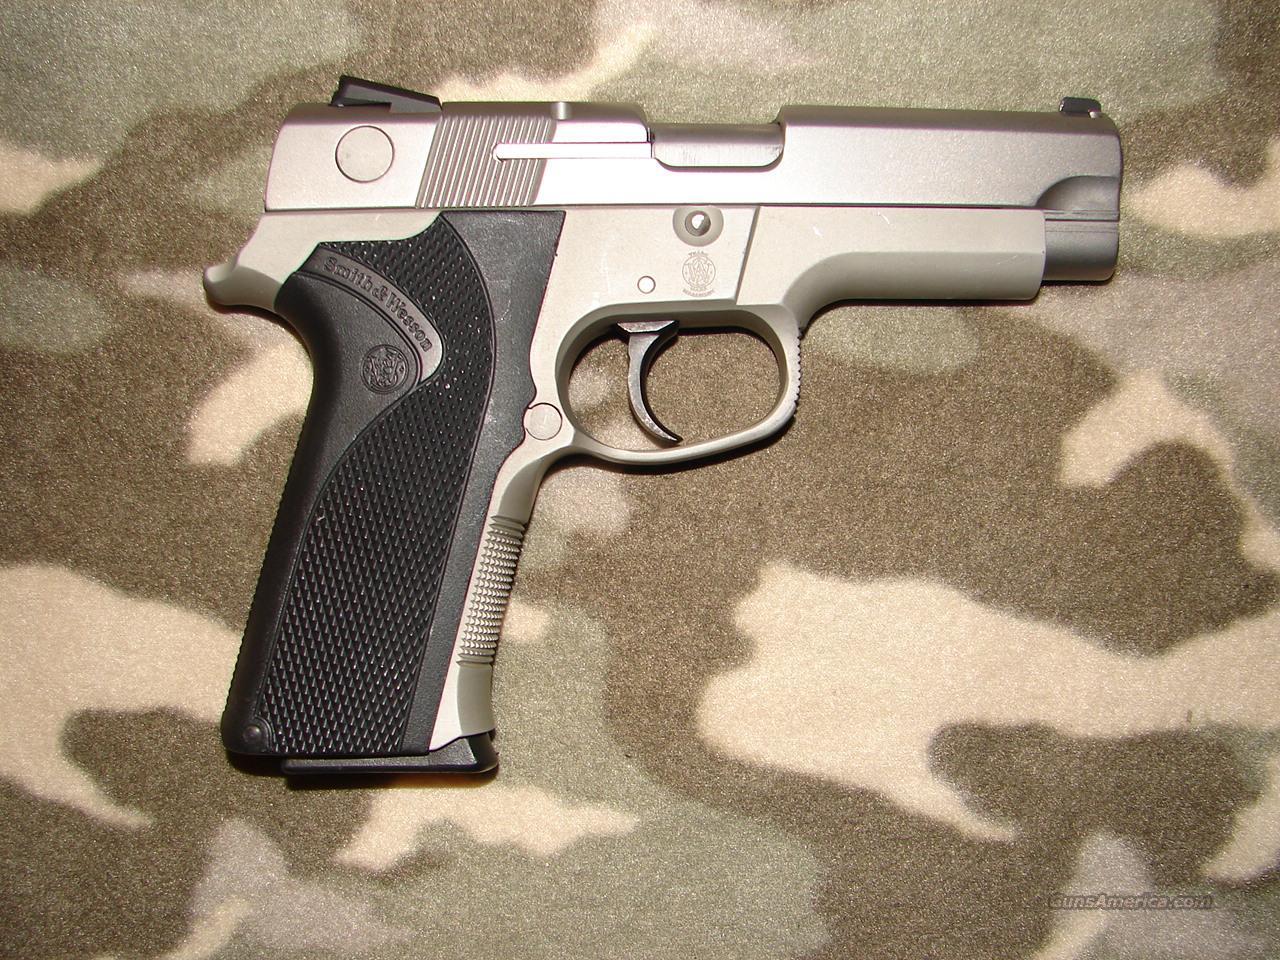 Smith & Wesson 4043  Guns > Pistols > Smith & Wesson Pistols - Autos > Alloy Frame